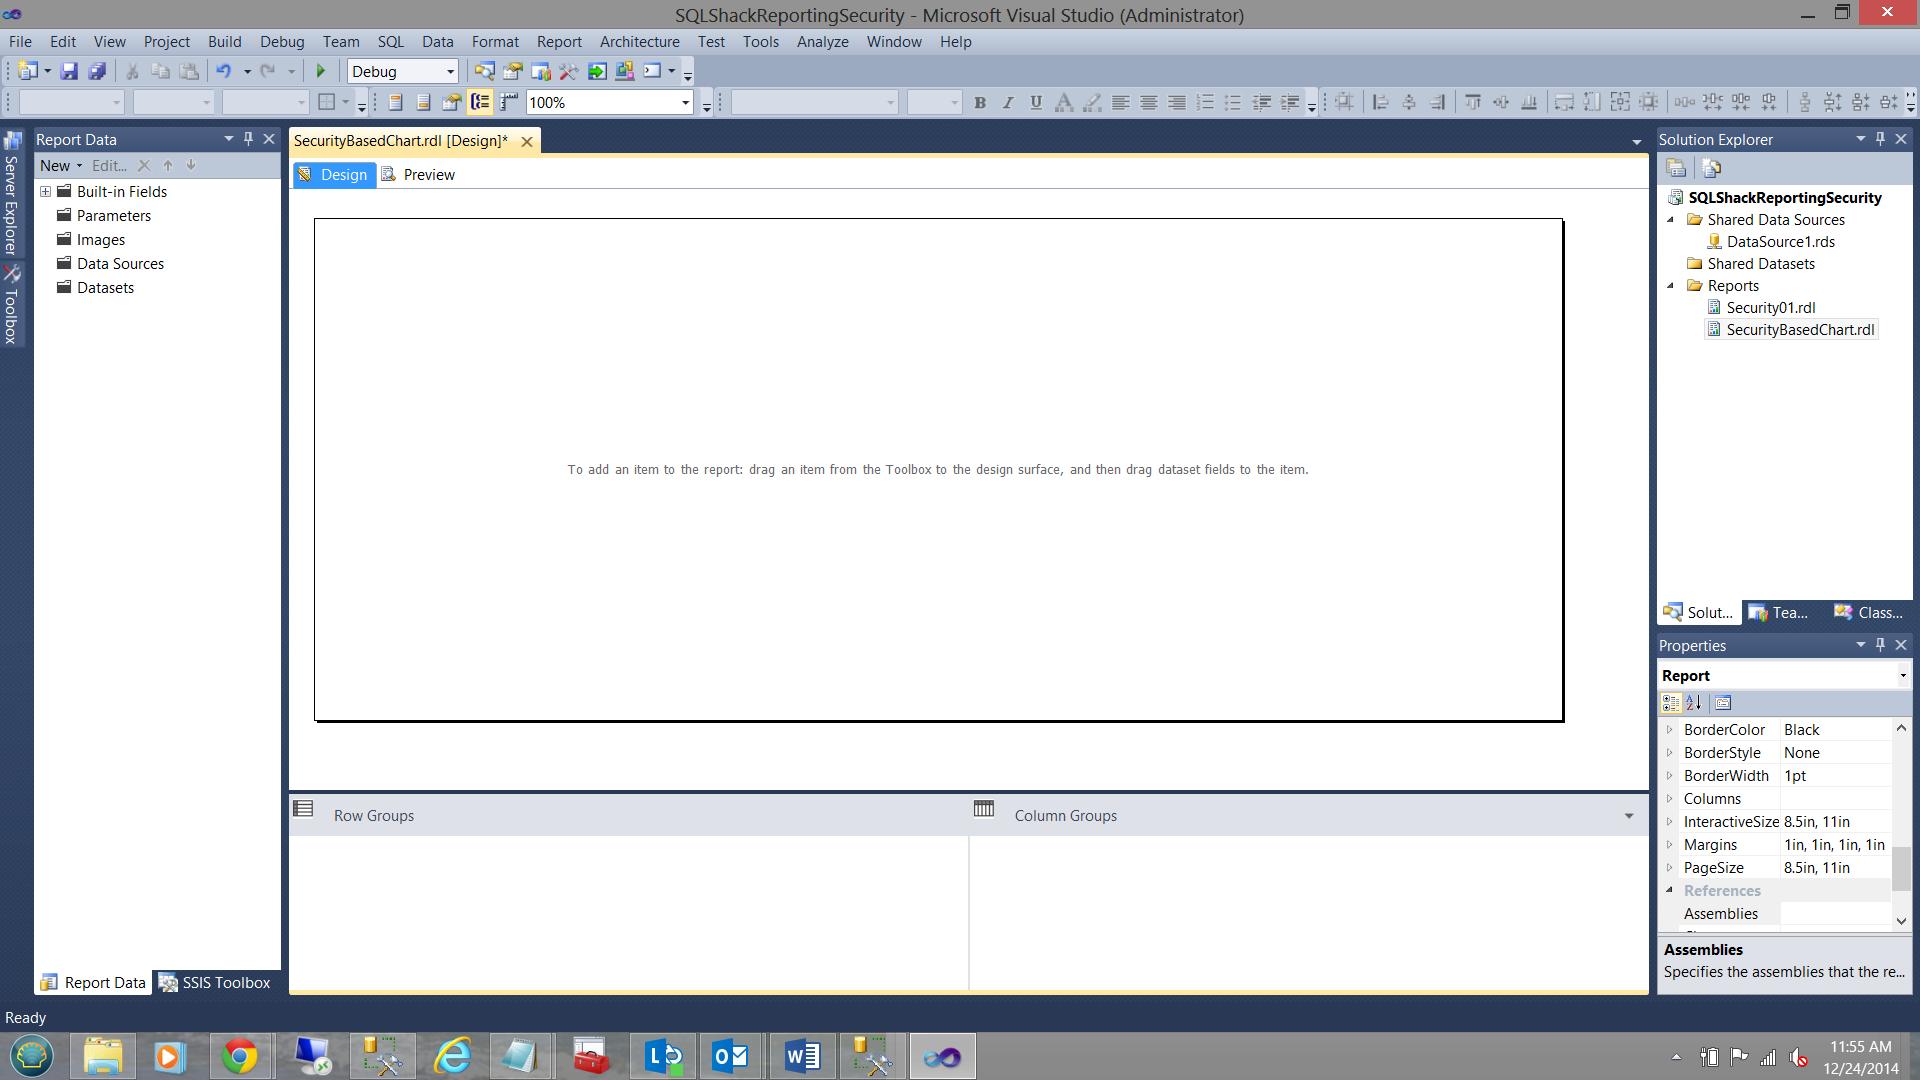 SQL Server安全机制–如何控制用户能够在报告中查看哪些数据16